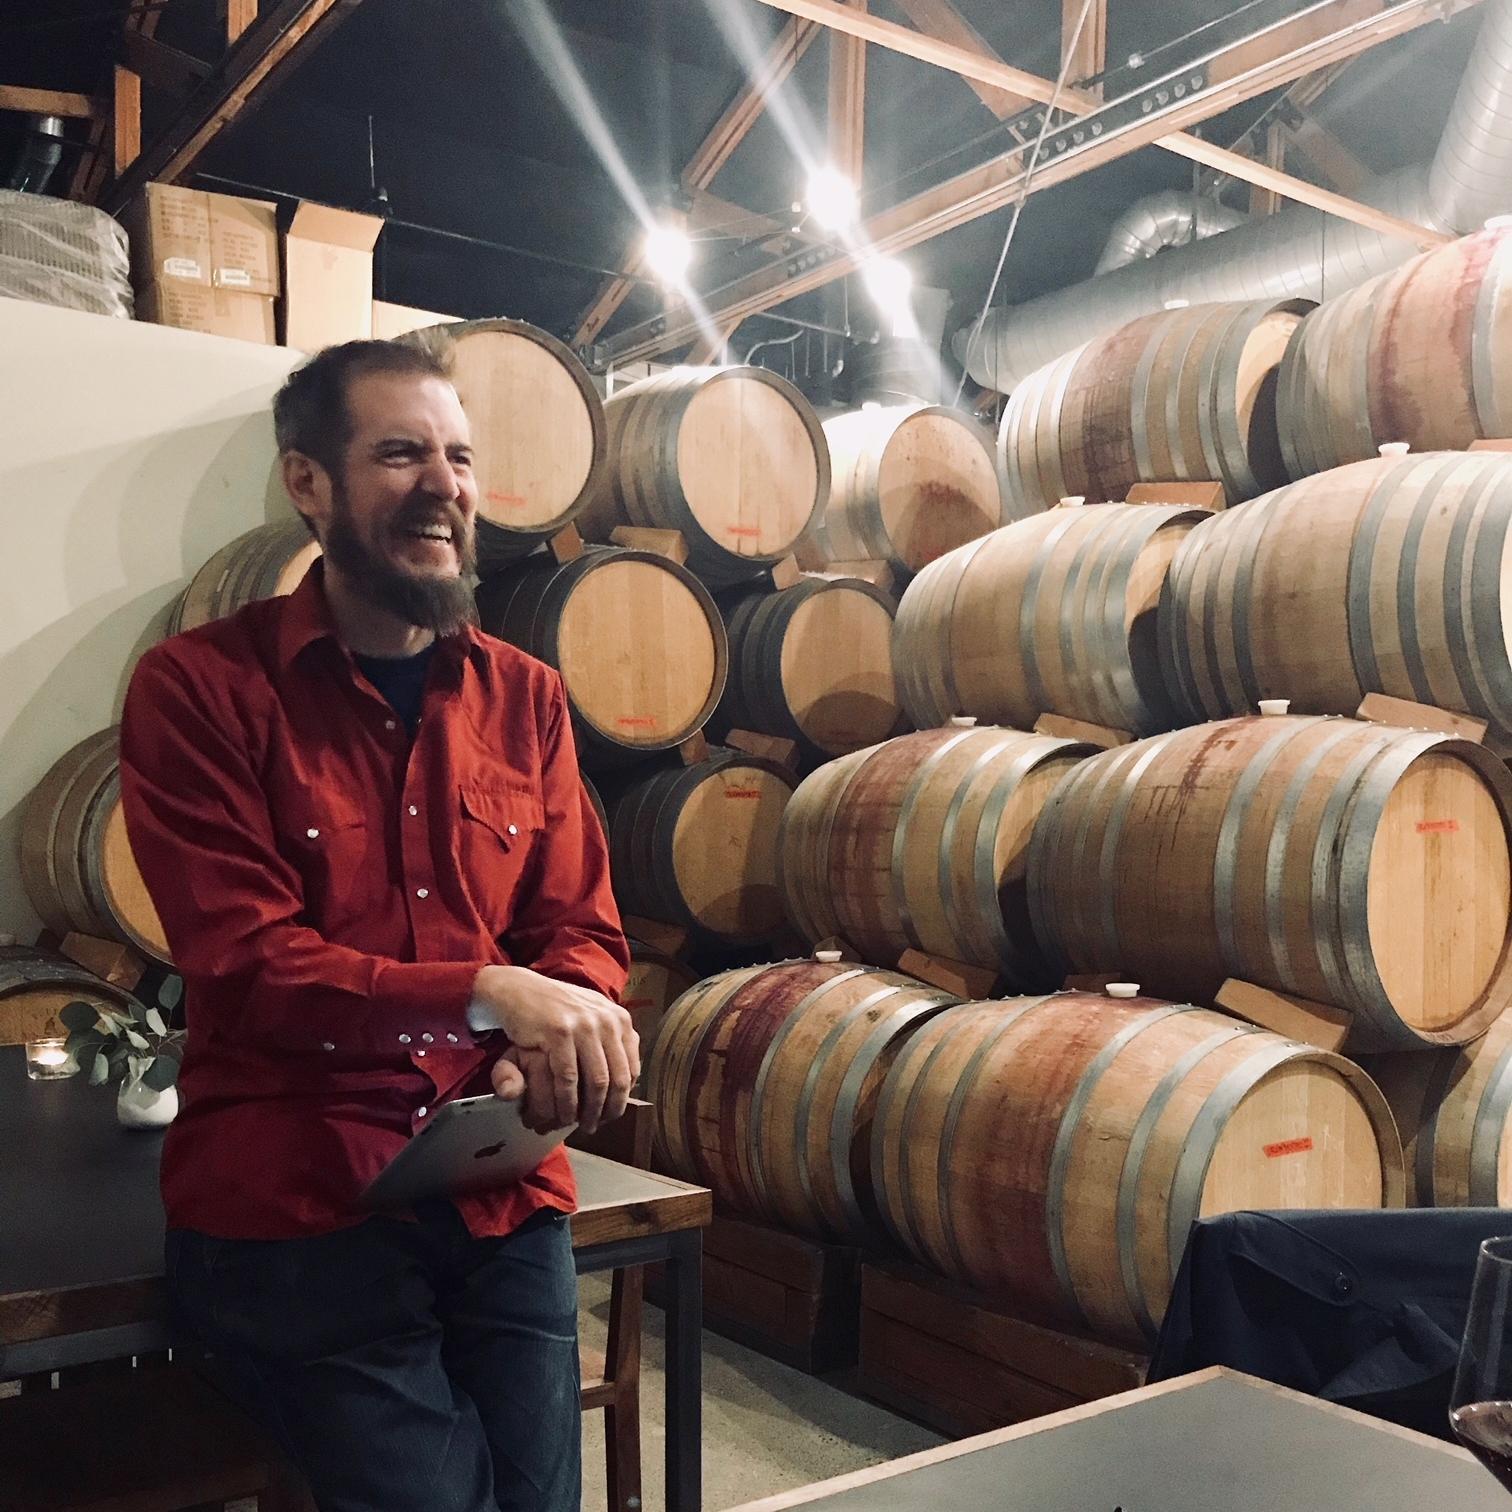 Carl Sutton at Potek Winery in Santa Barbara (image: Ashley W Hollister)